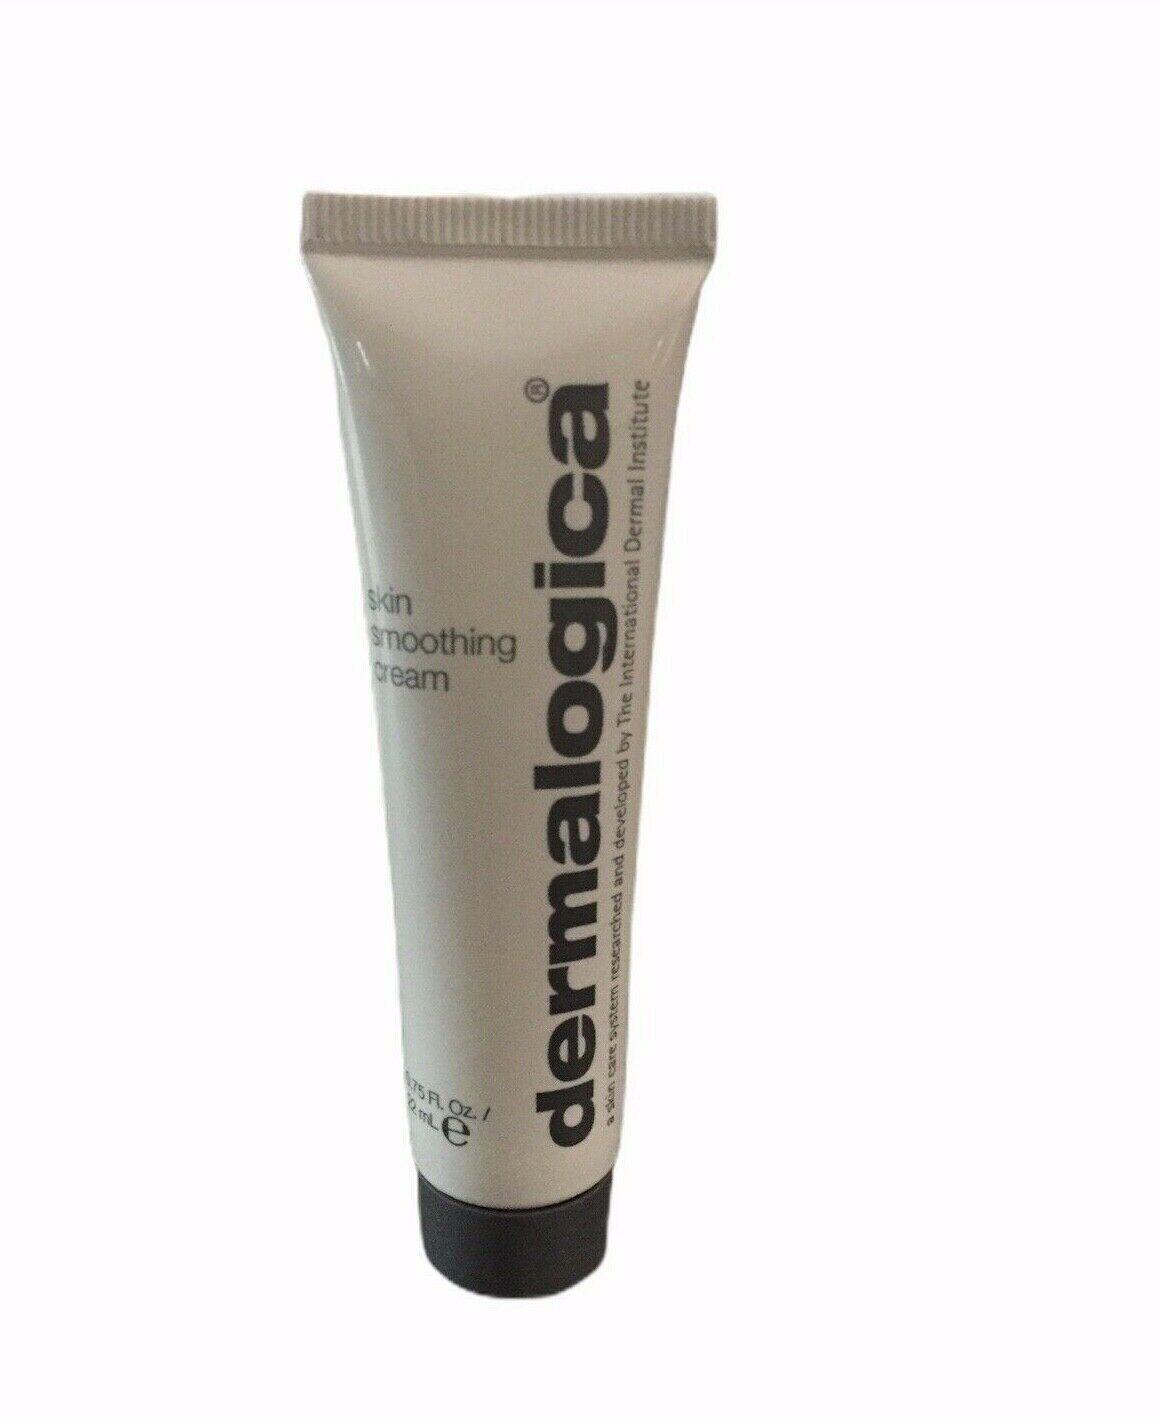 Dermalogica Skin Smoothing Cream 0,75 oz / 22ml NEW.  No Box  FREE SHIPPING - $13.98